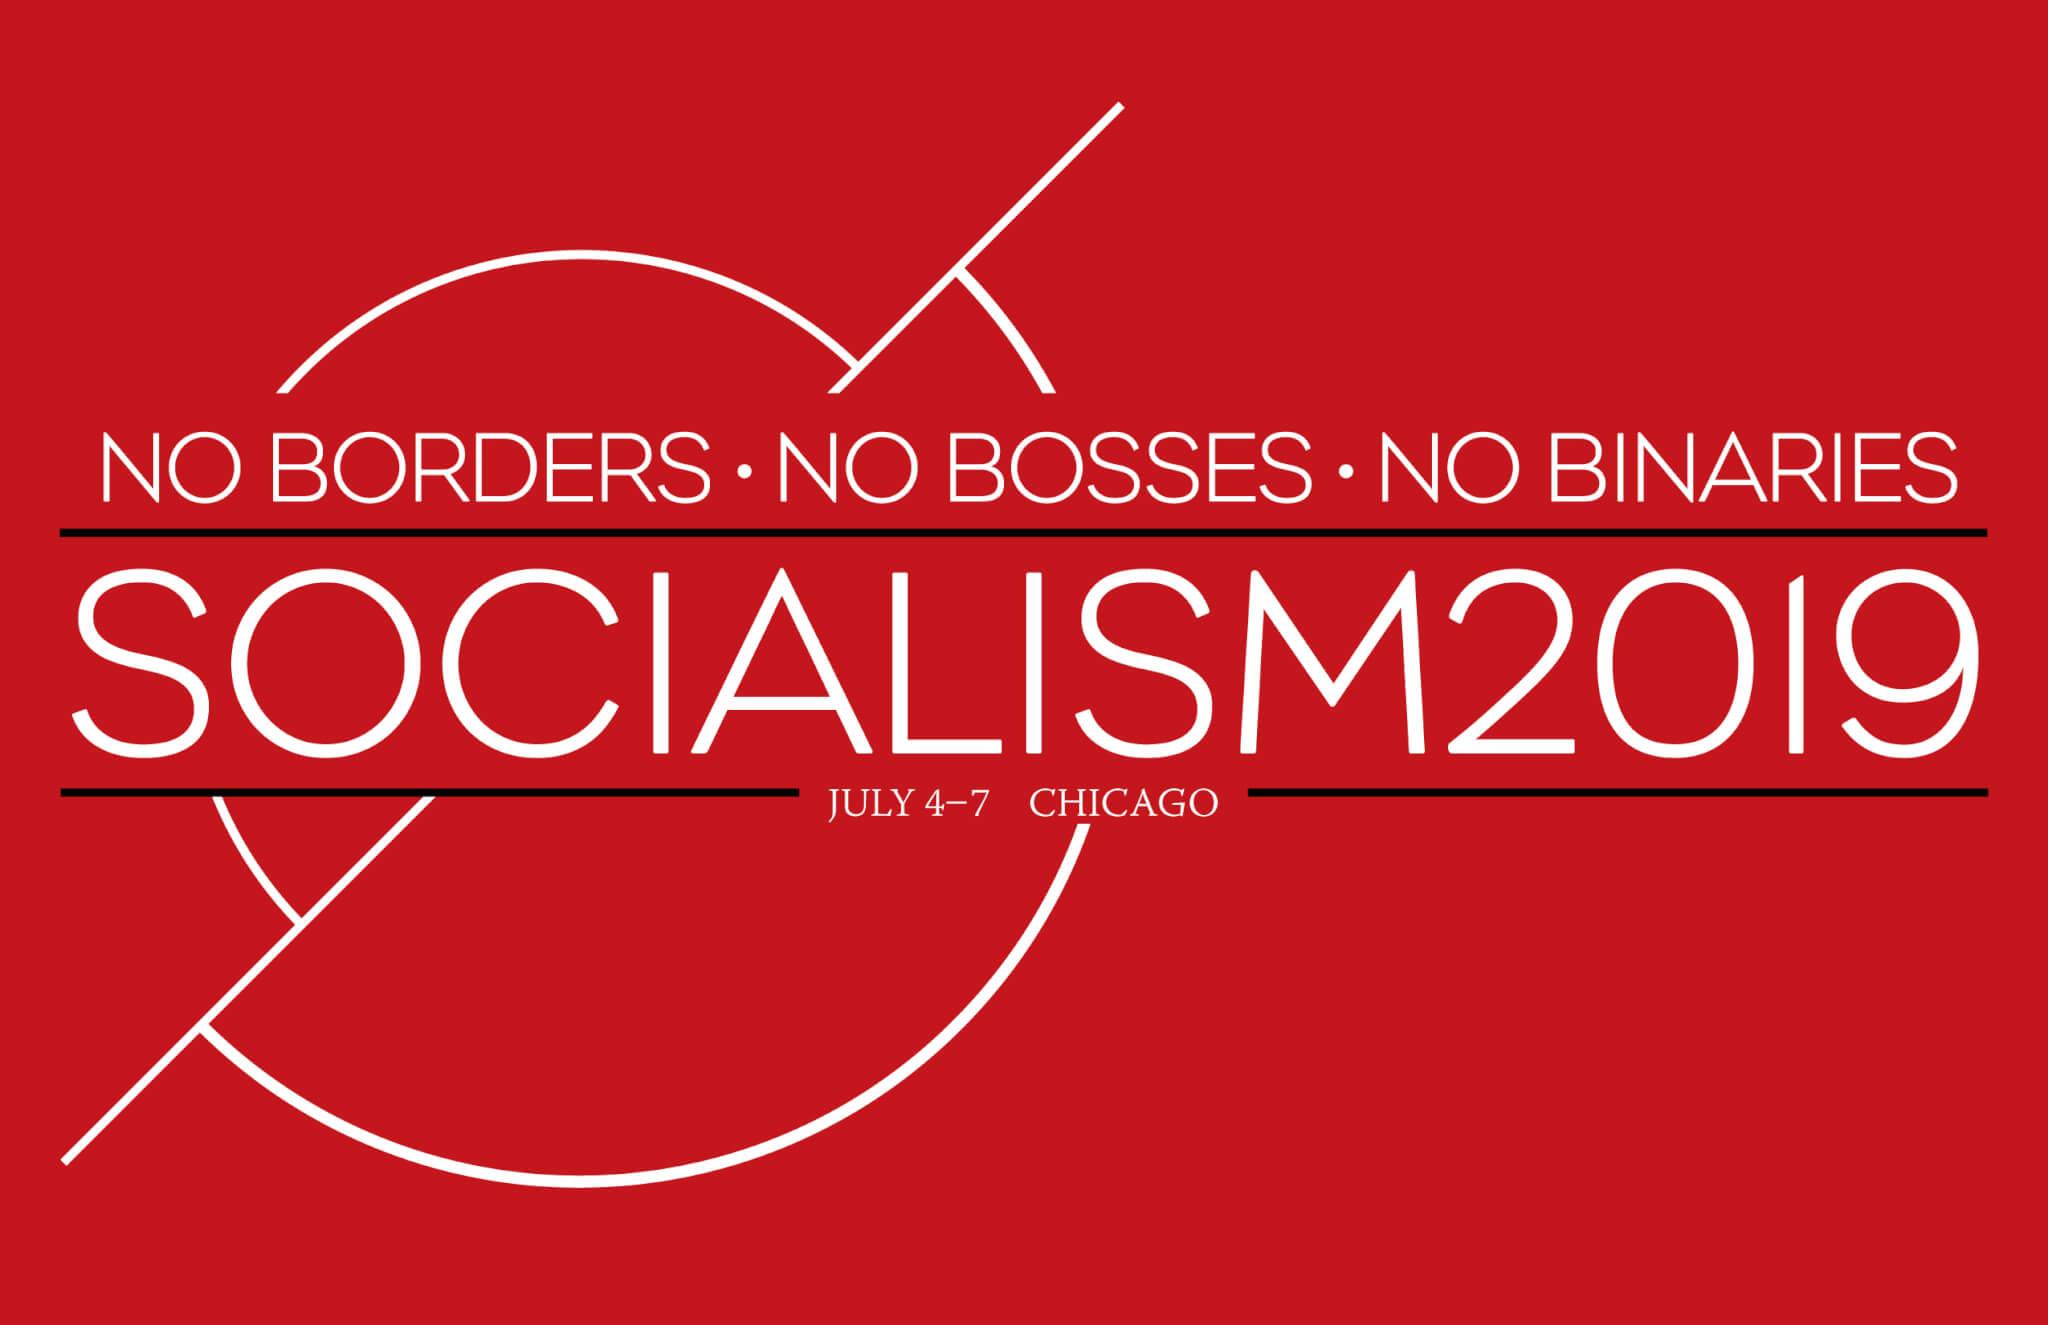 Socialism Conference 2019 - July 4-7, Chicago - Socialism 2019